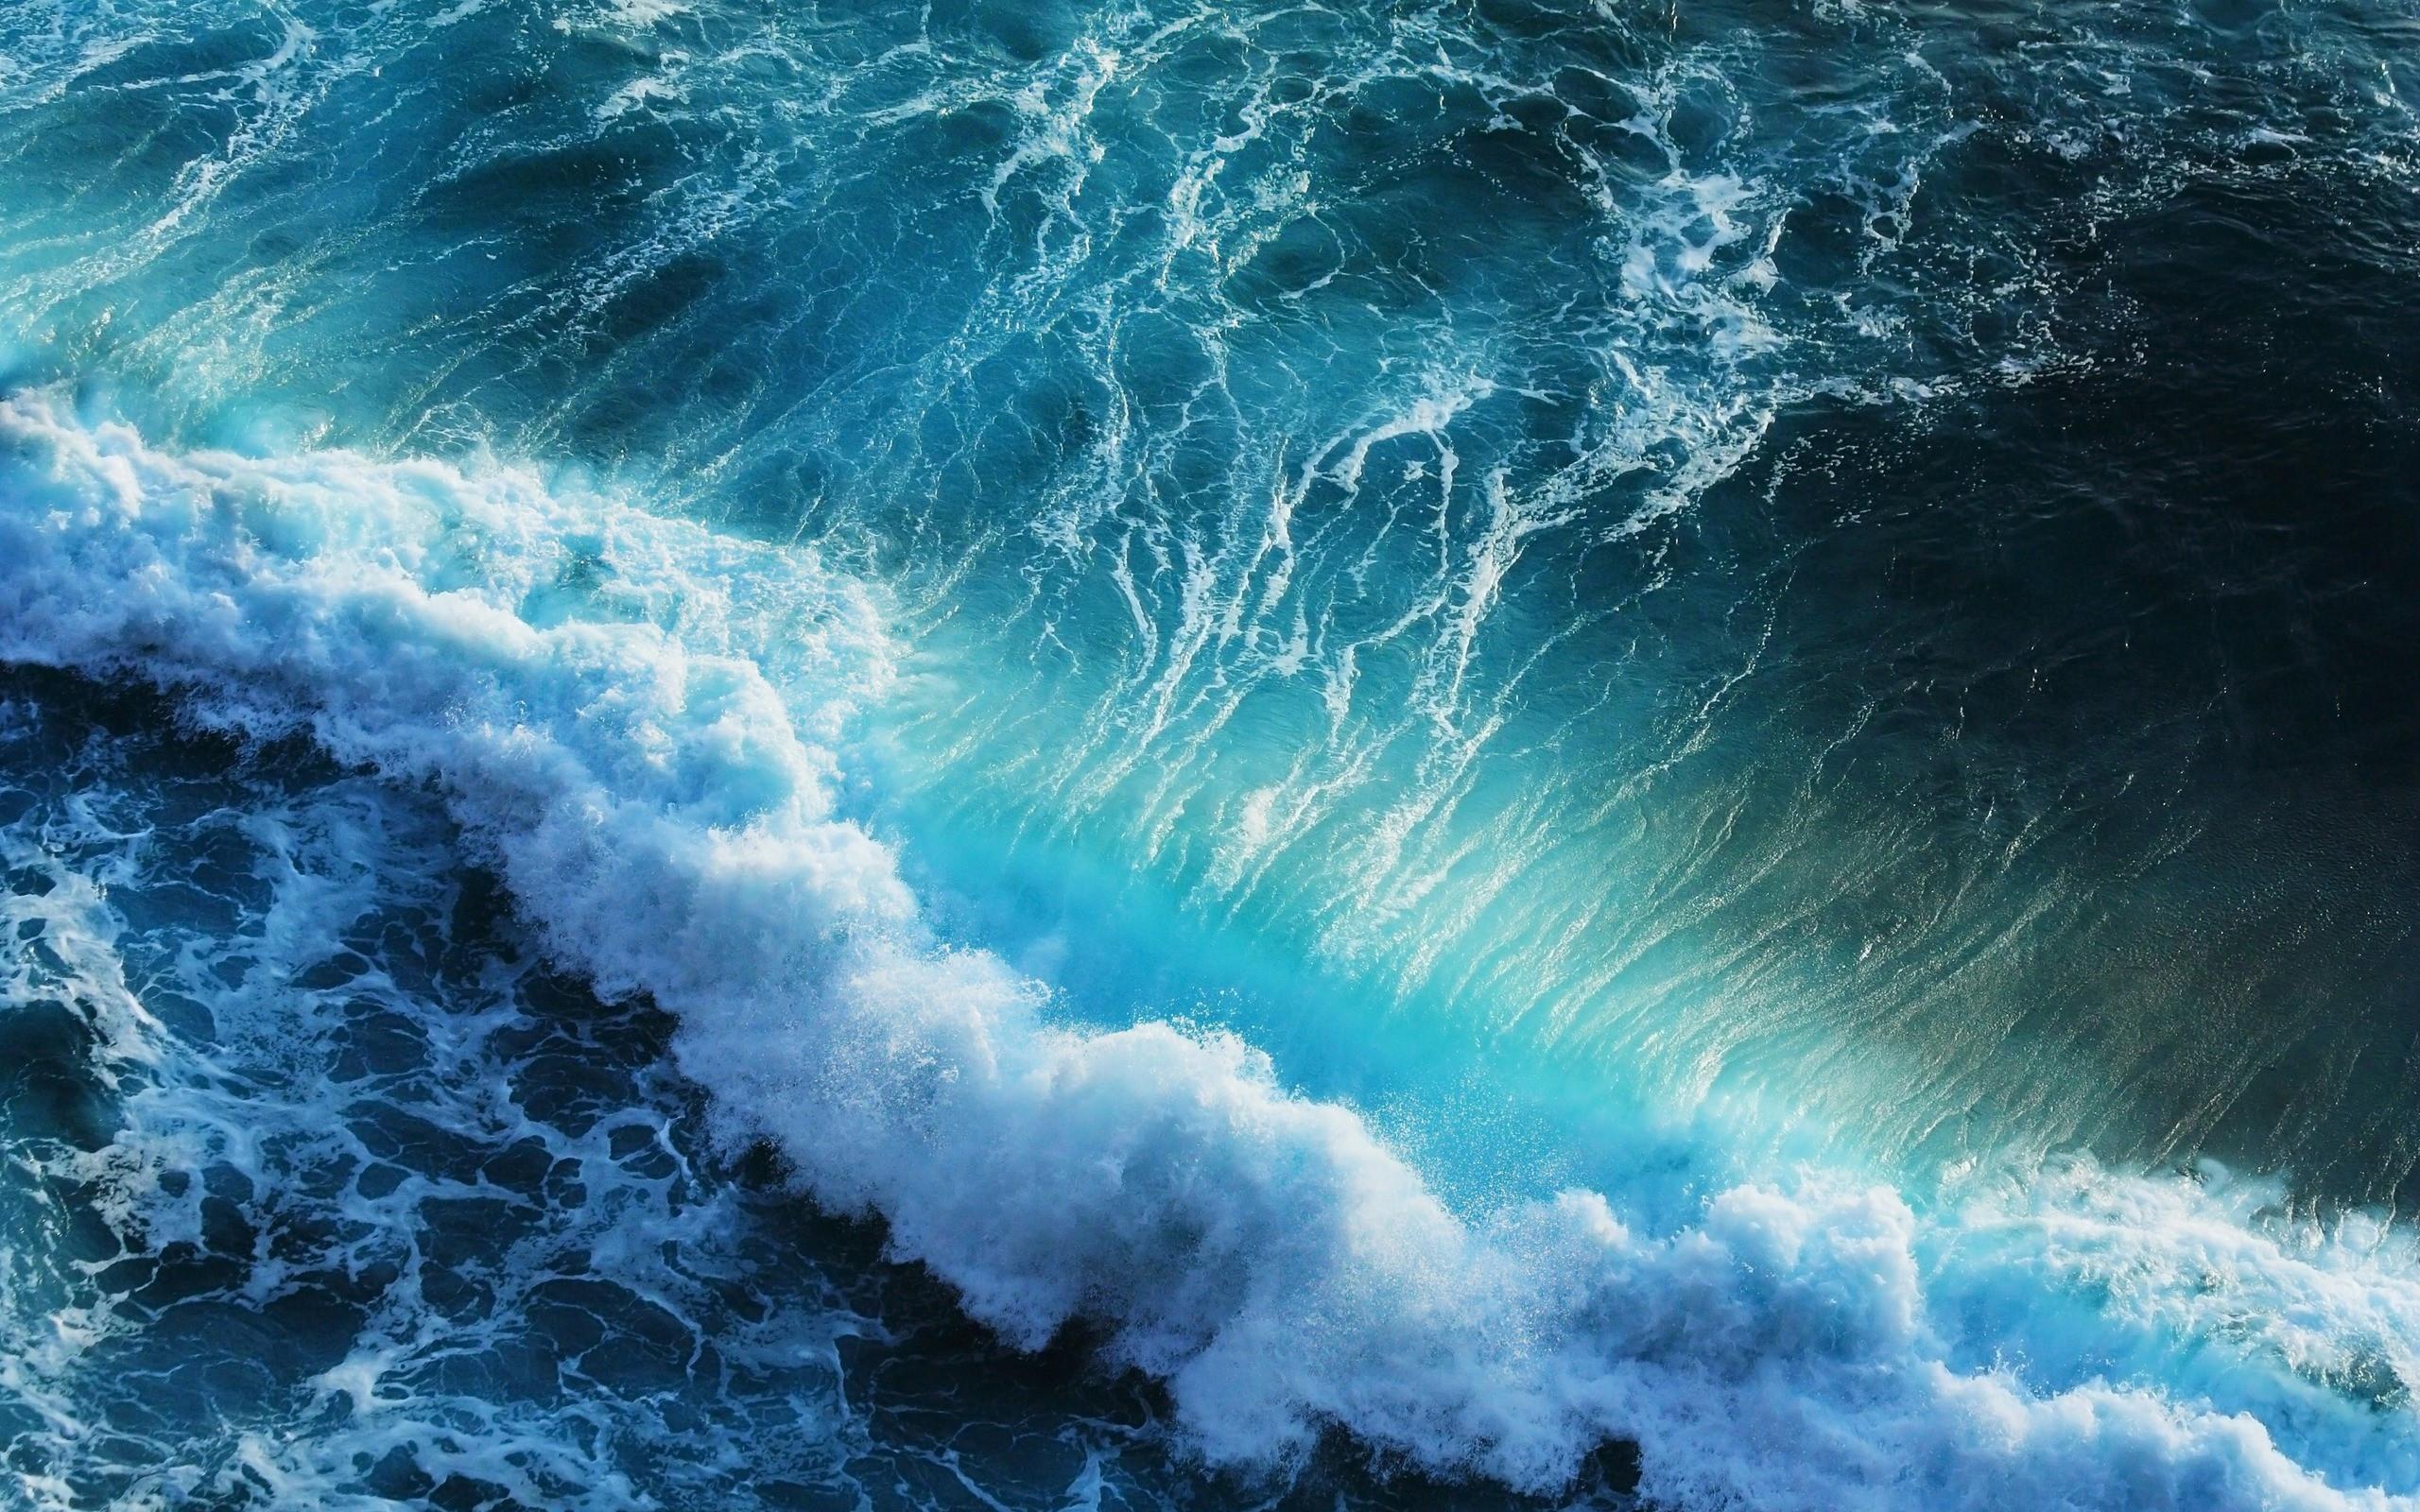 Ocean-waves-wallpaper-HD